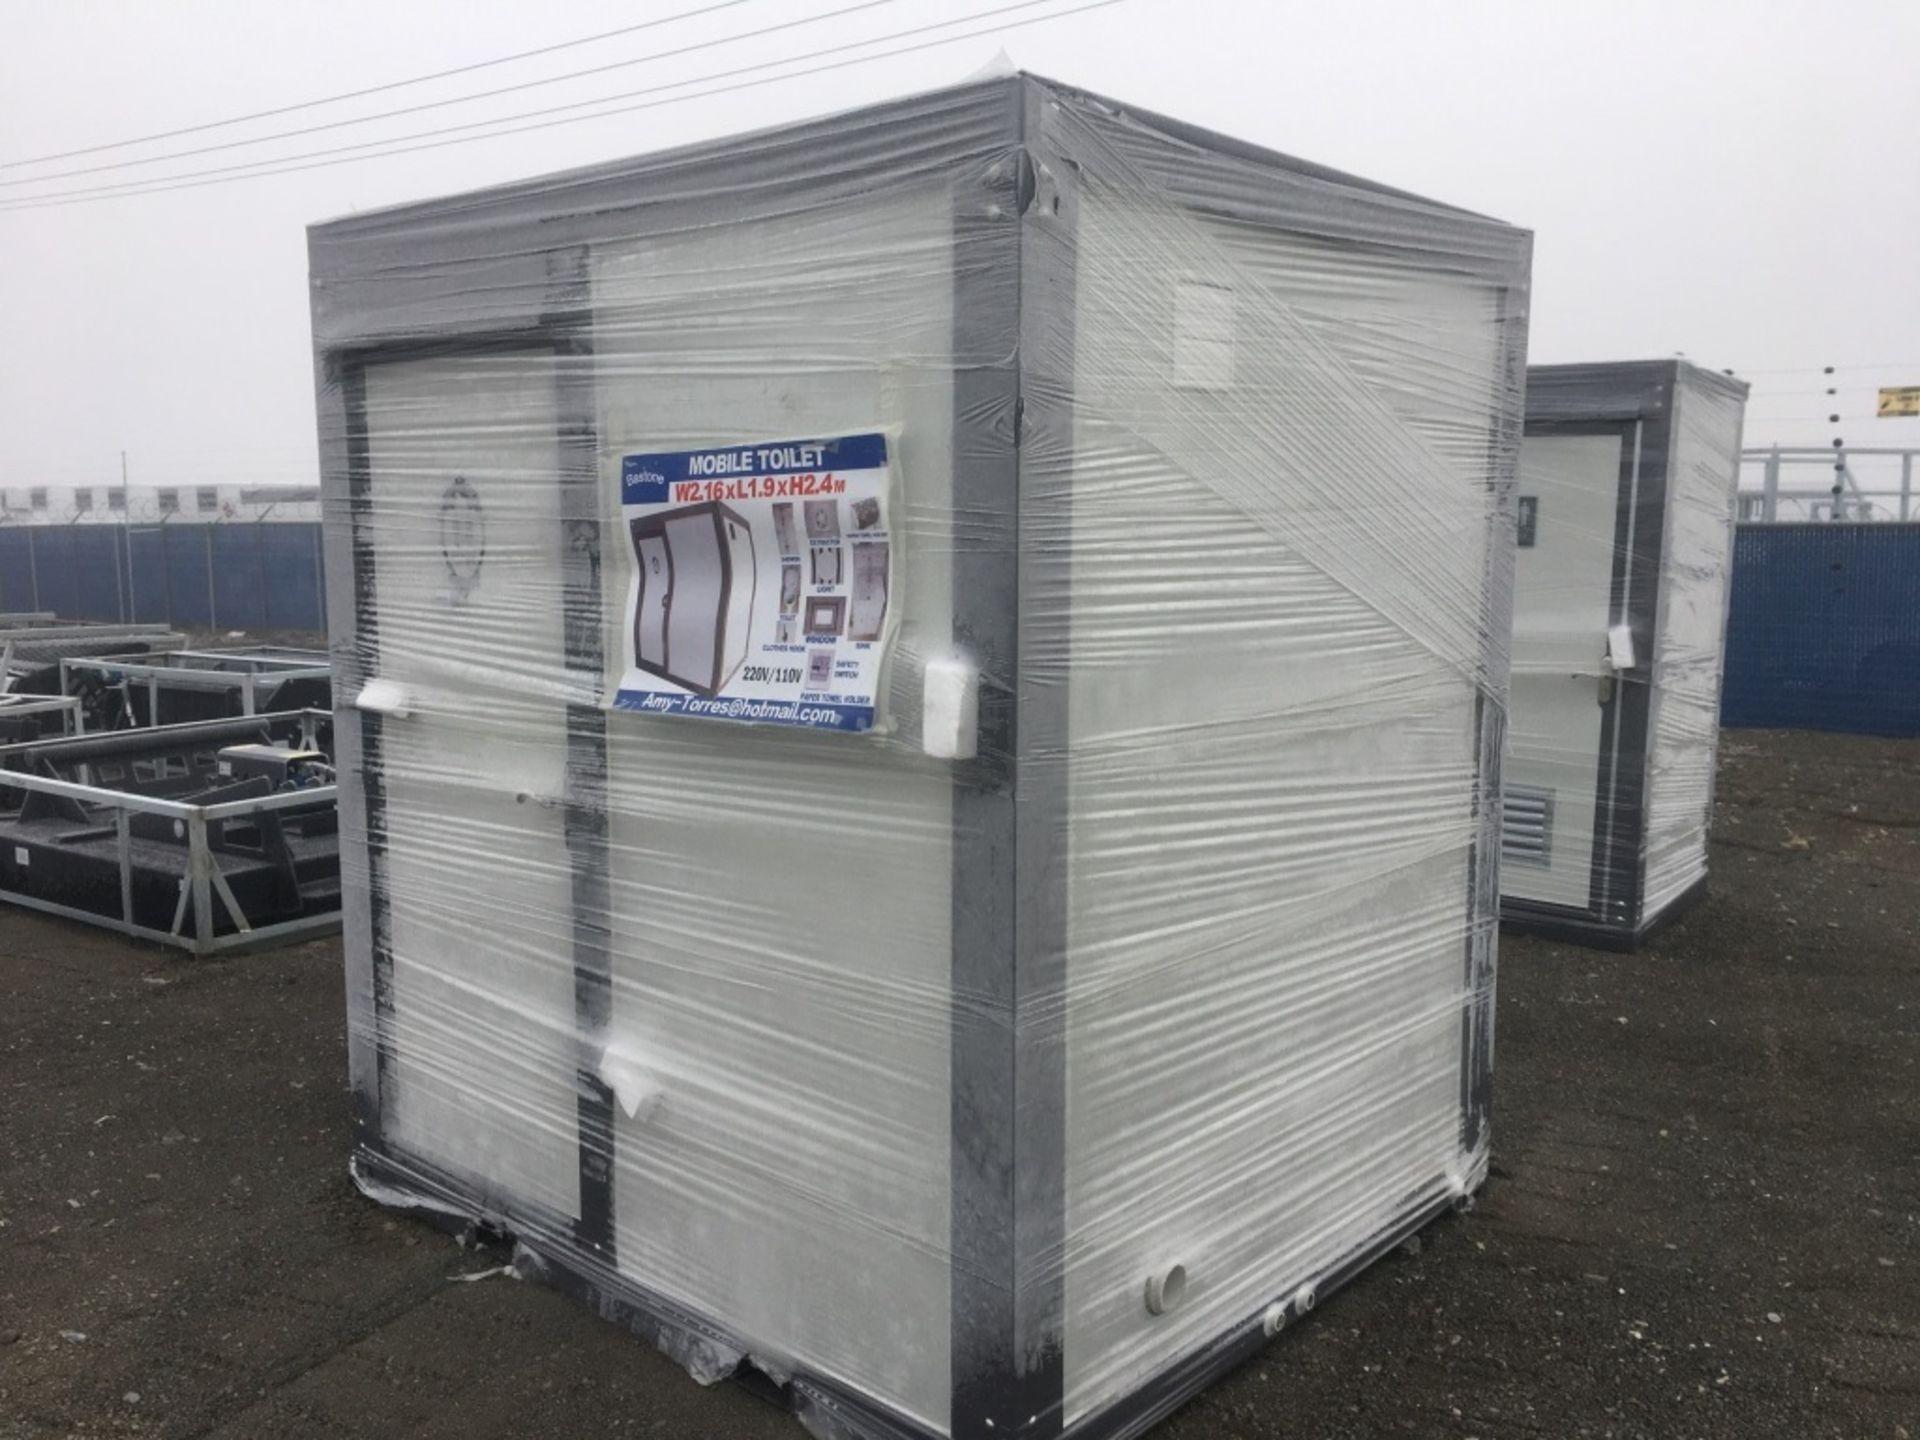 2020 Bastone Portable Restroom w/Shower - Image 2 of 5